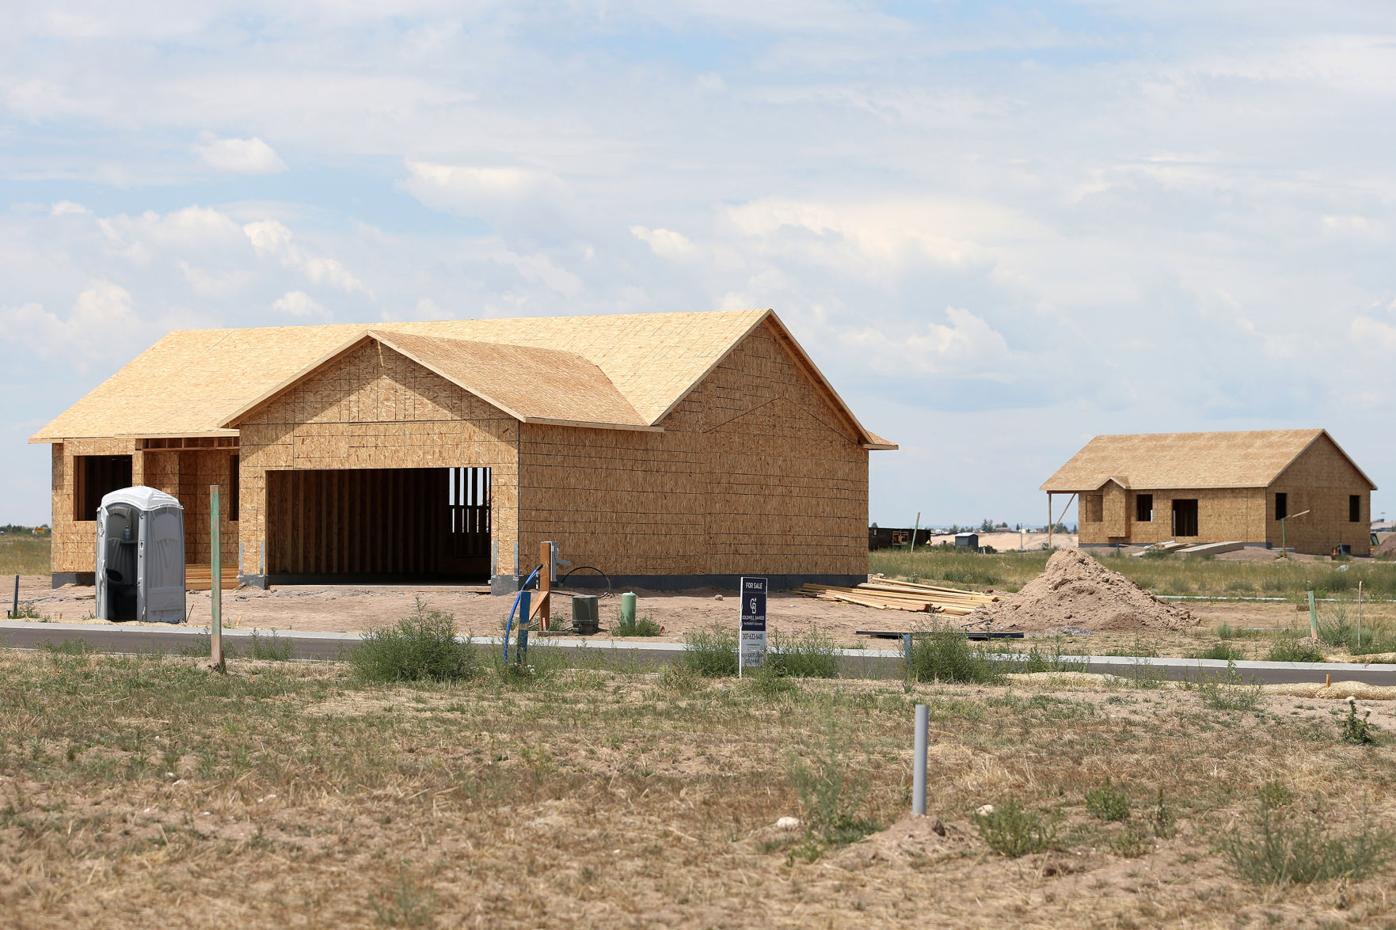 20200802-news-housing-mc-2.JPG